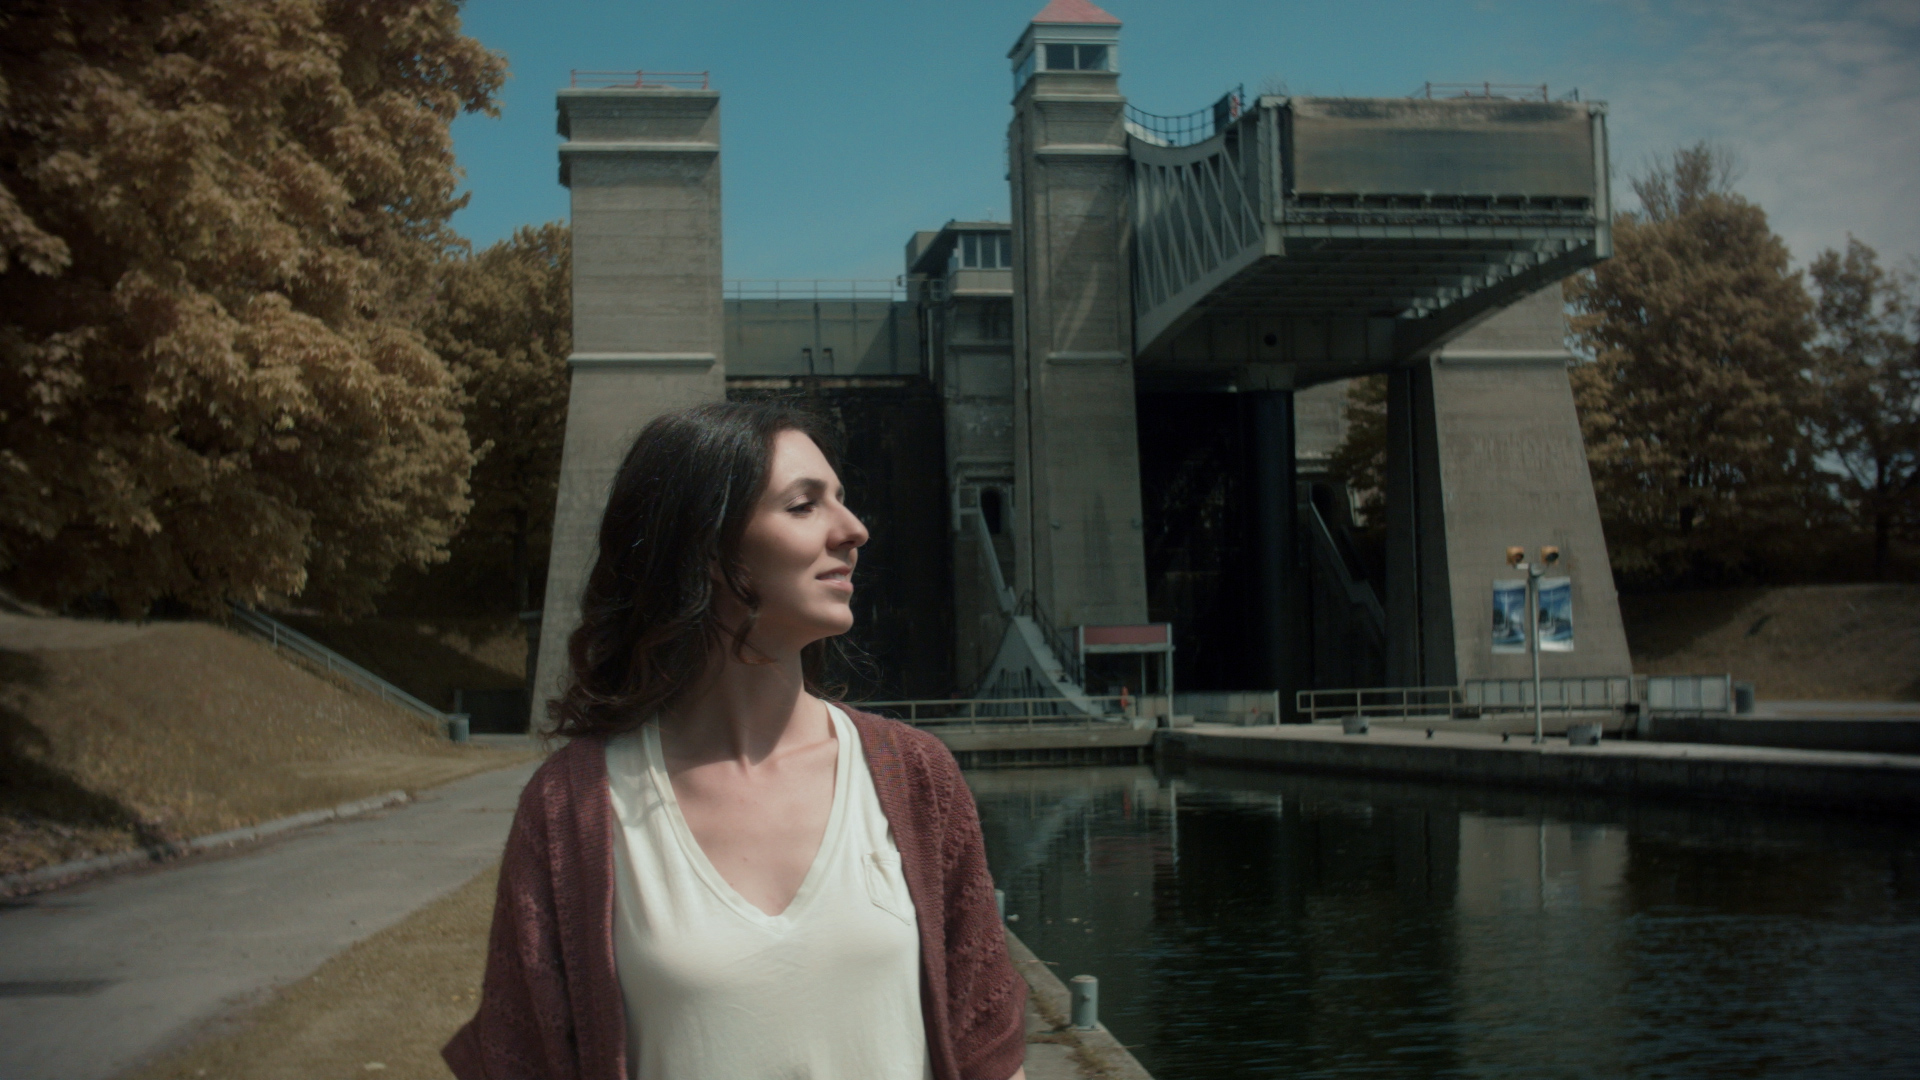 Danielle in Episode 6